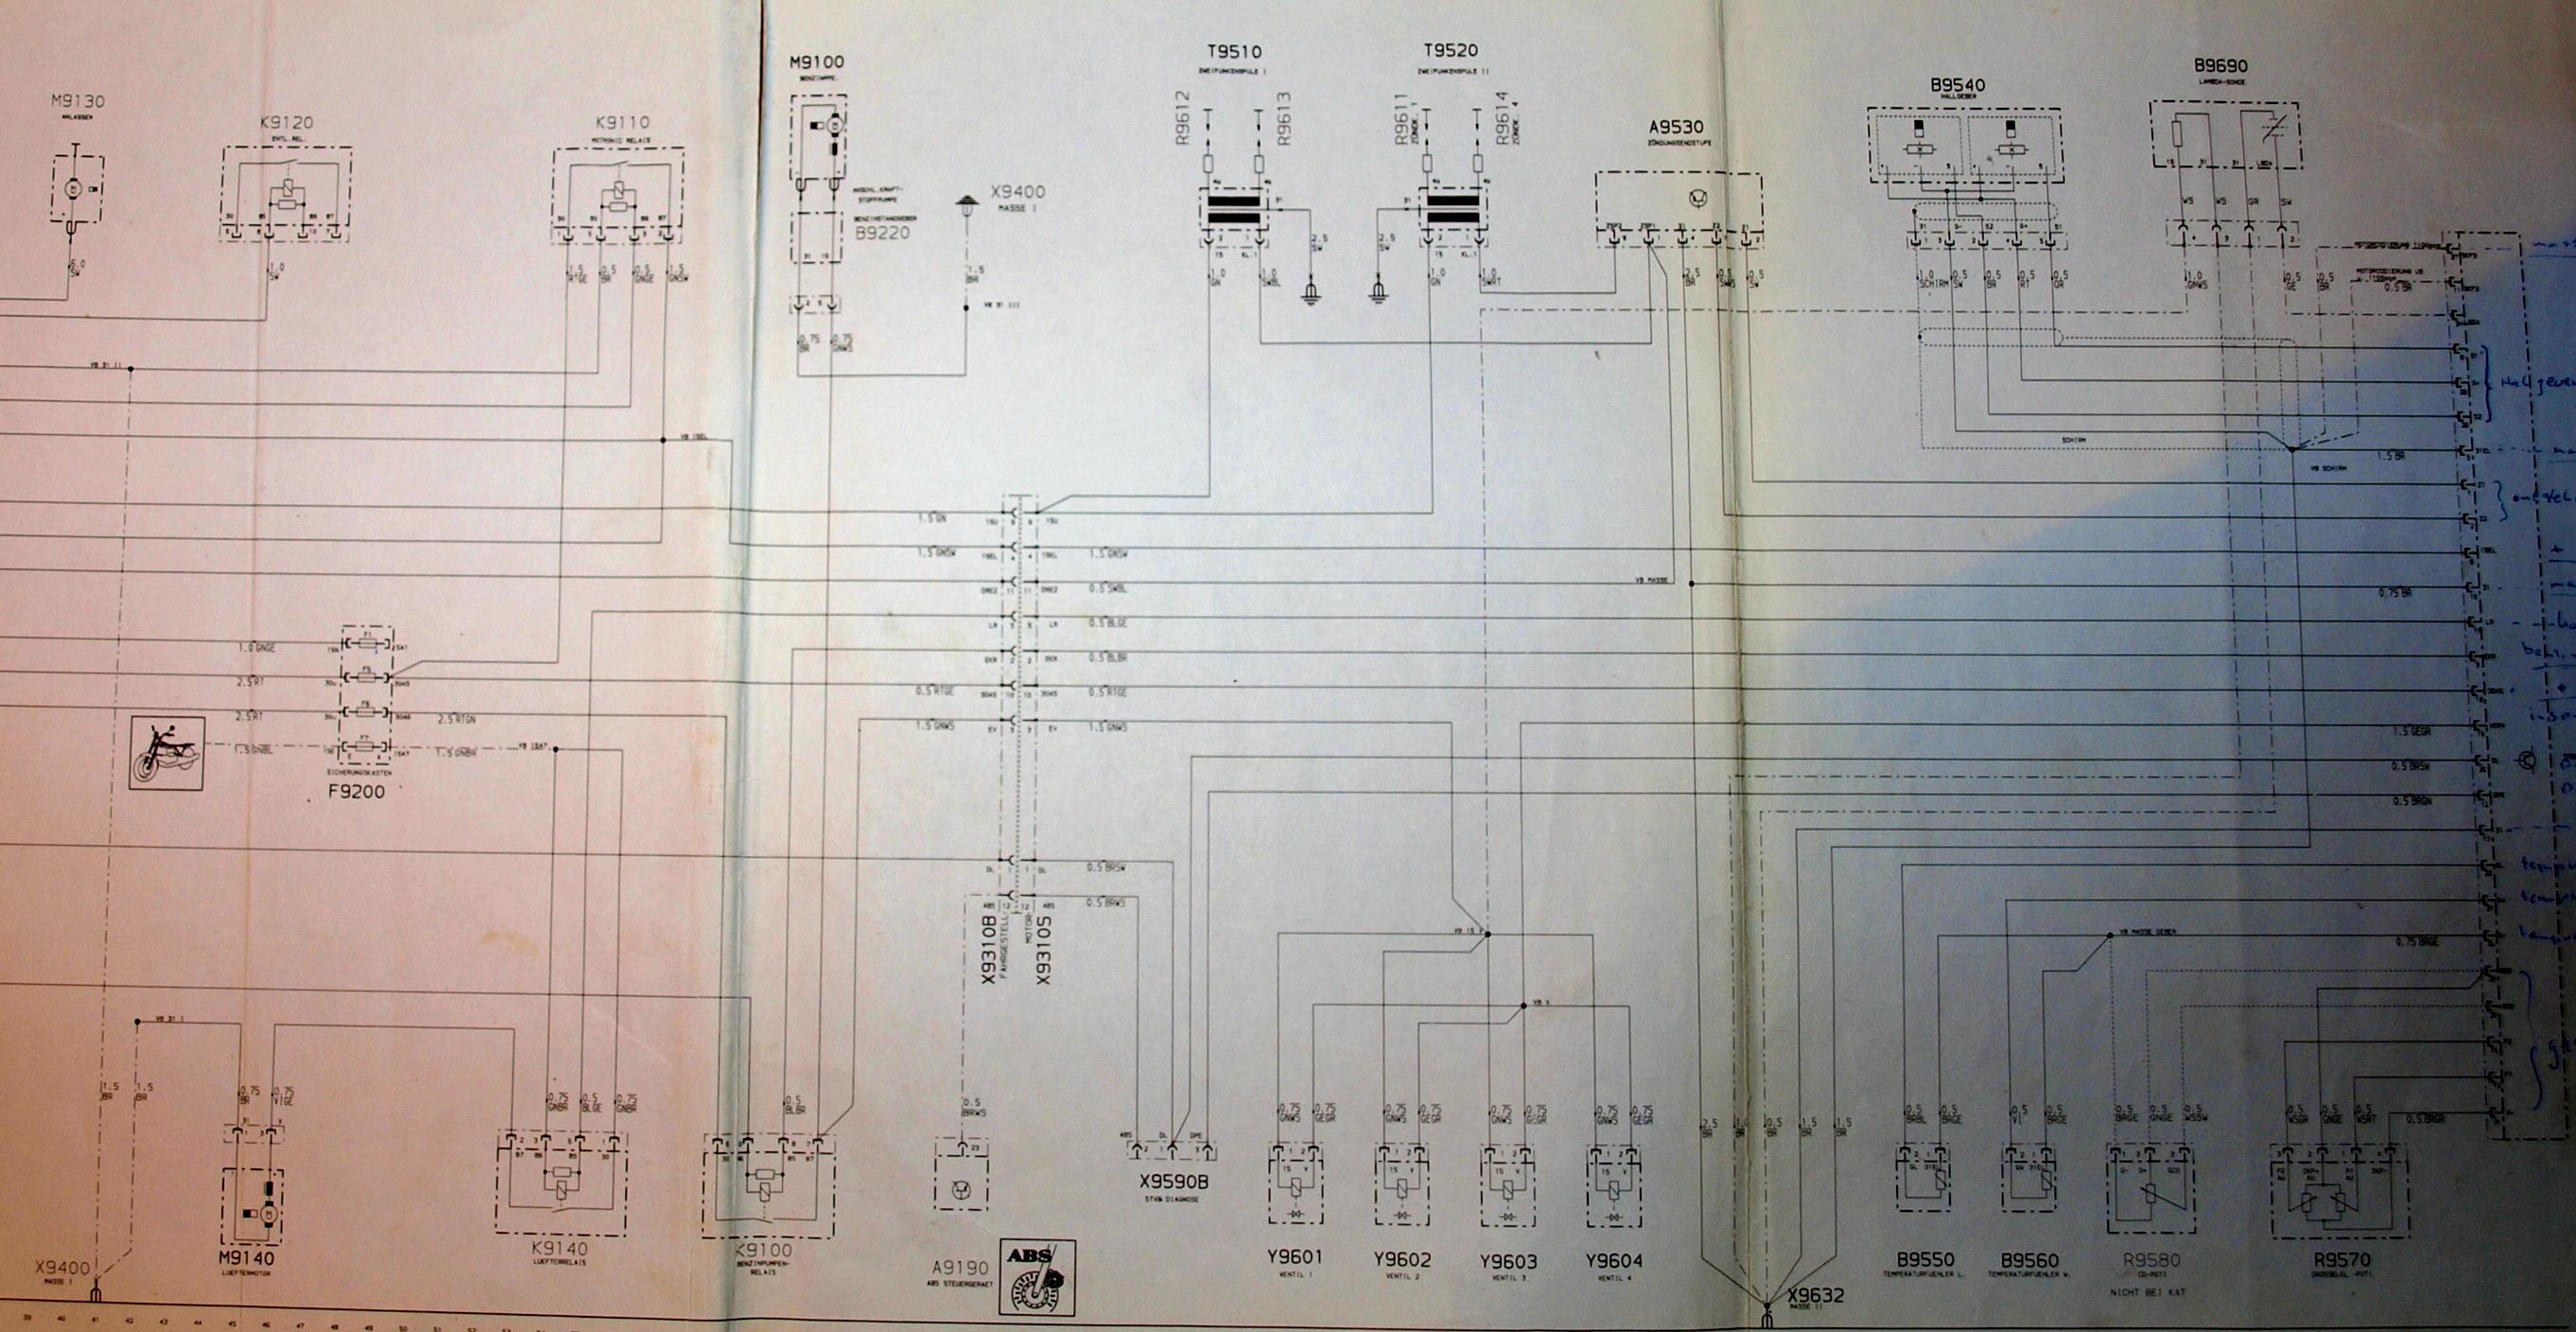 bmw valt uit - pagina 10